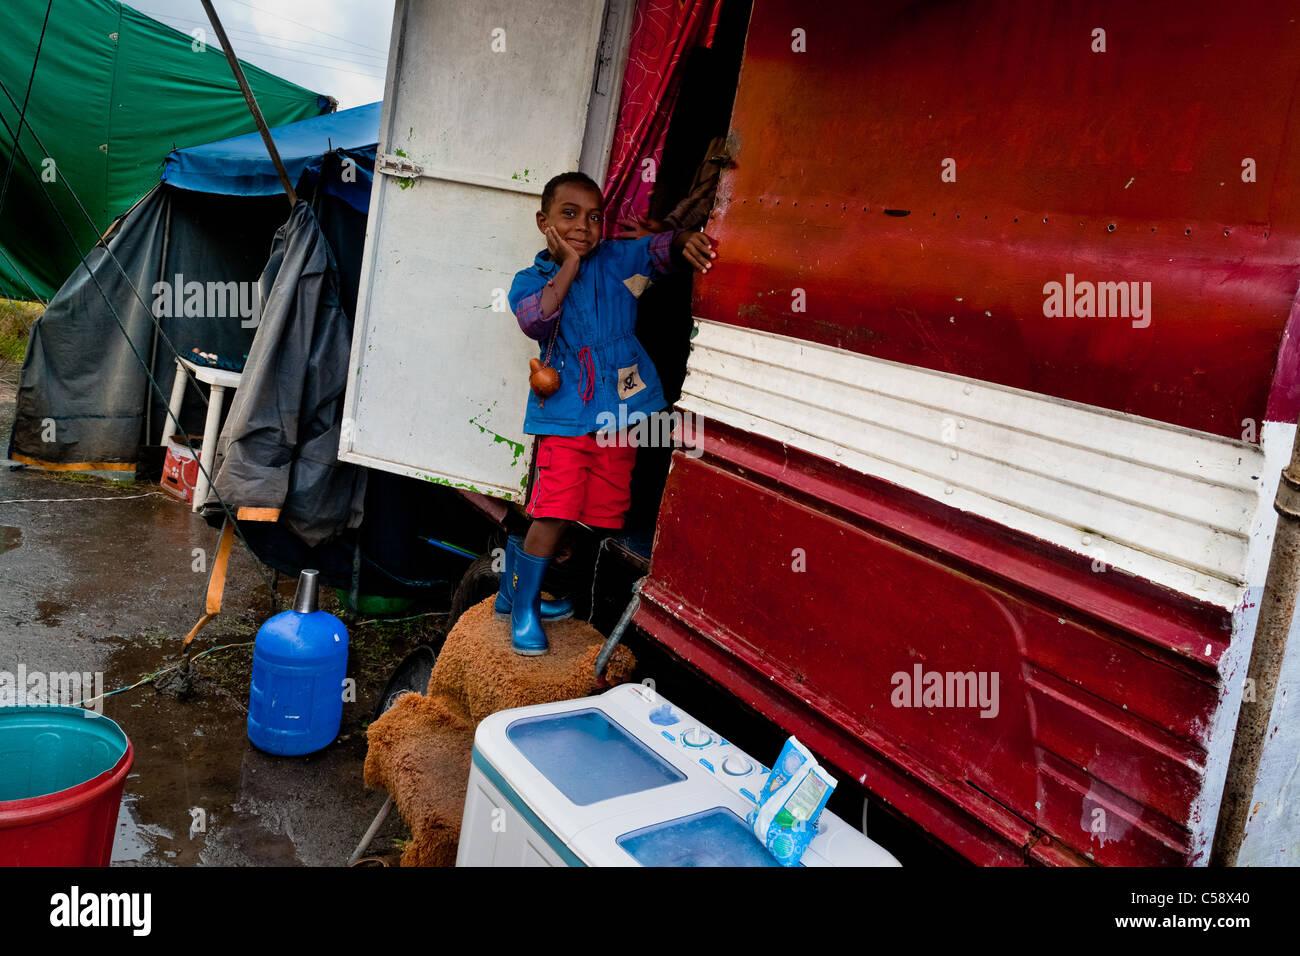 A Colombian boy enters his trailer at the Circo Anny, a family run circus wandering the Amazon region of Ecuador. - Stock Image